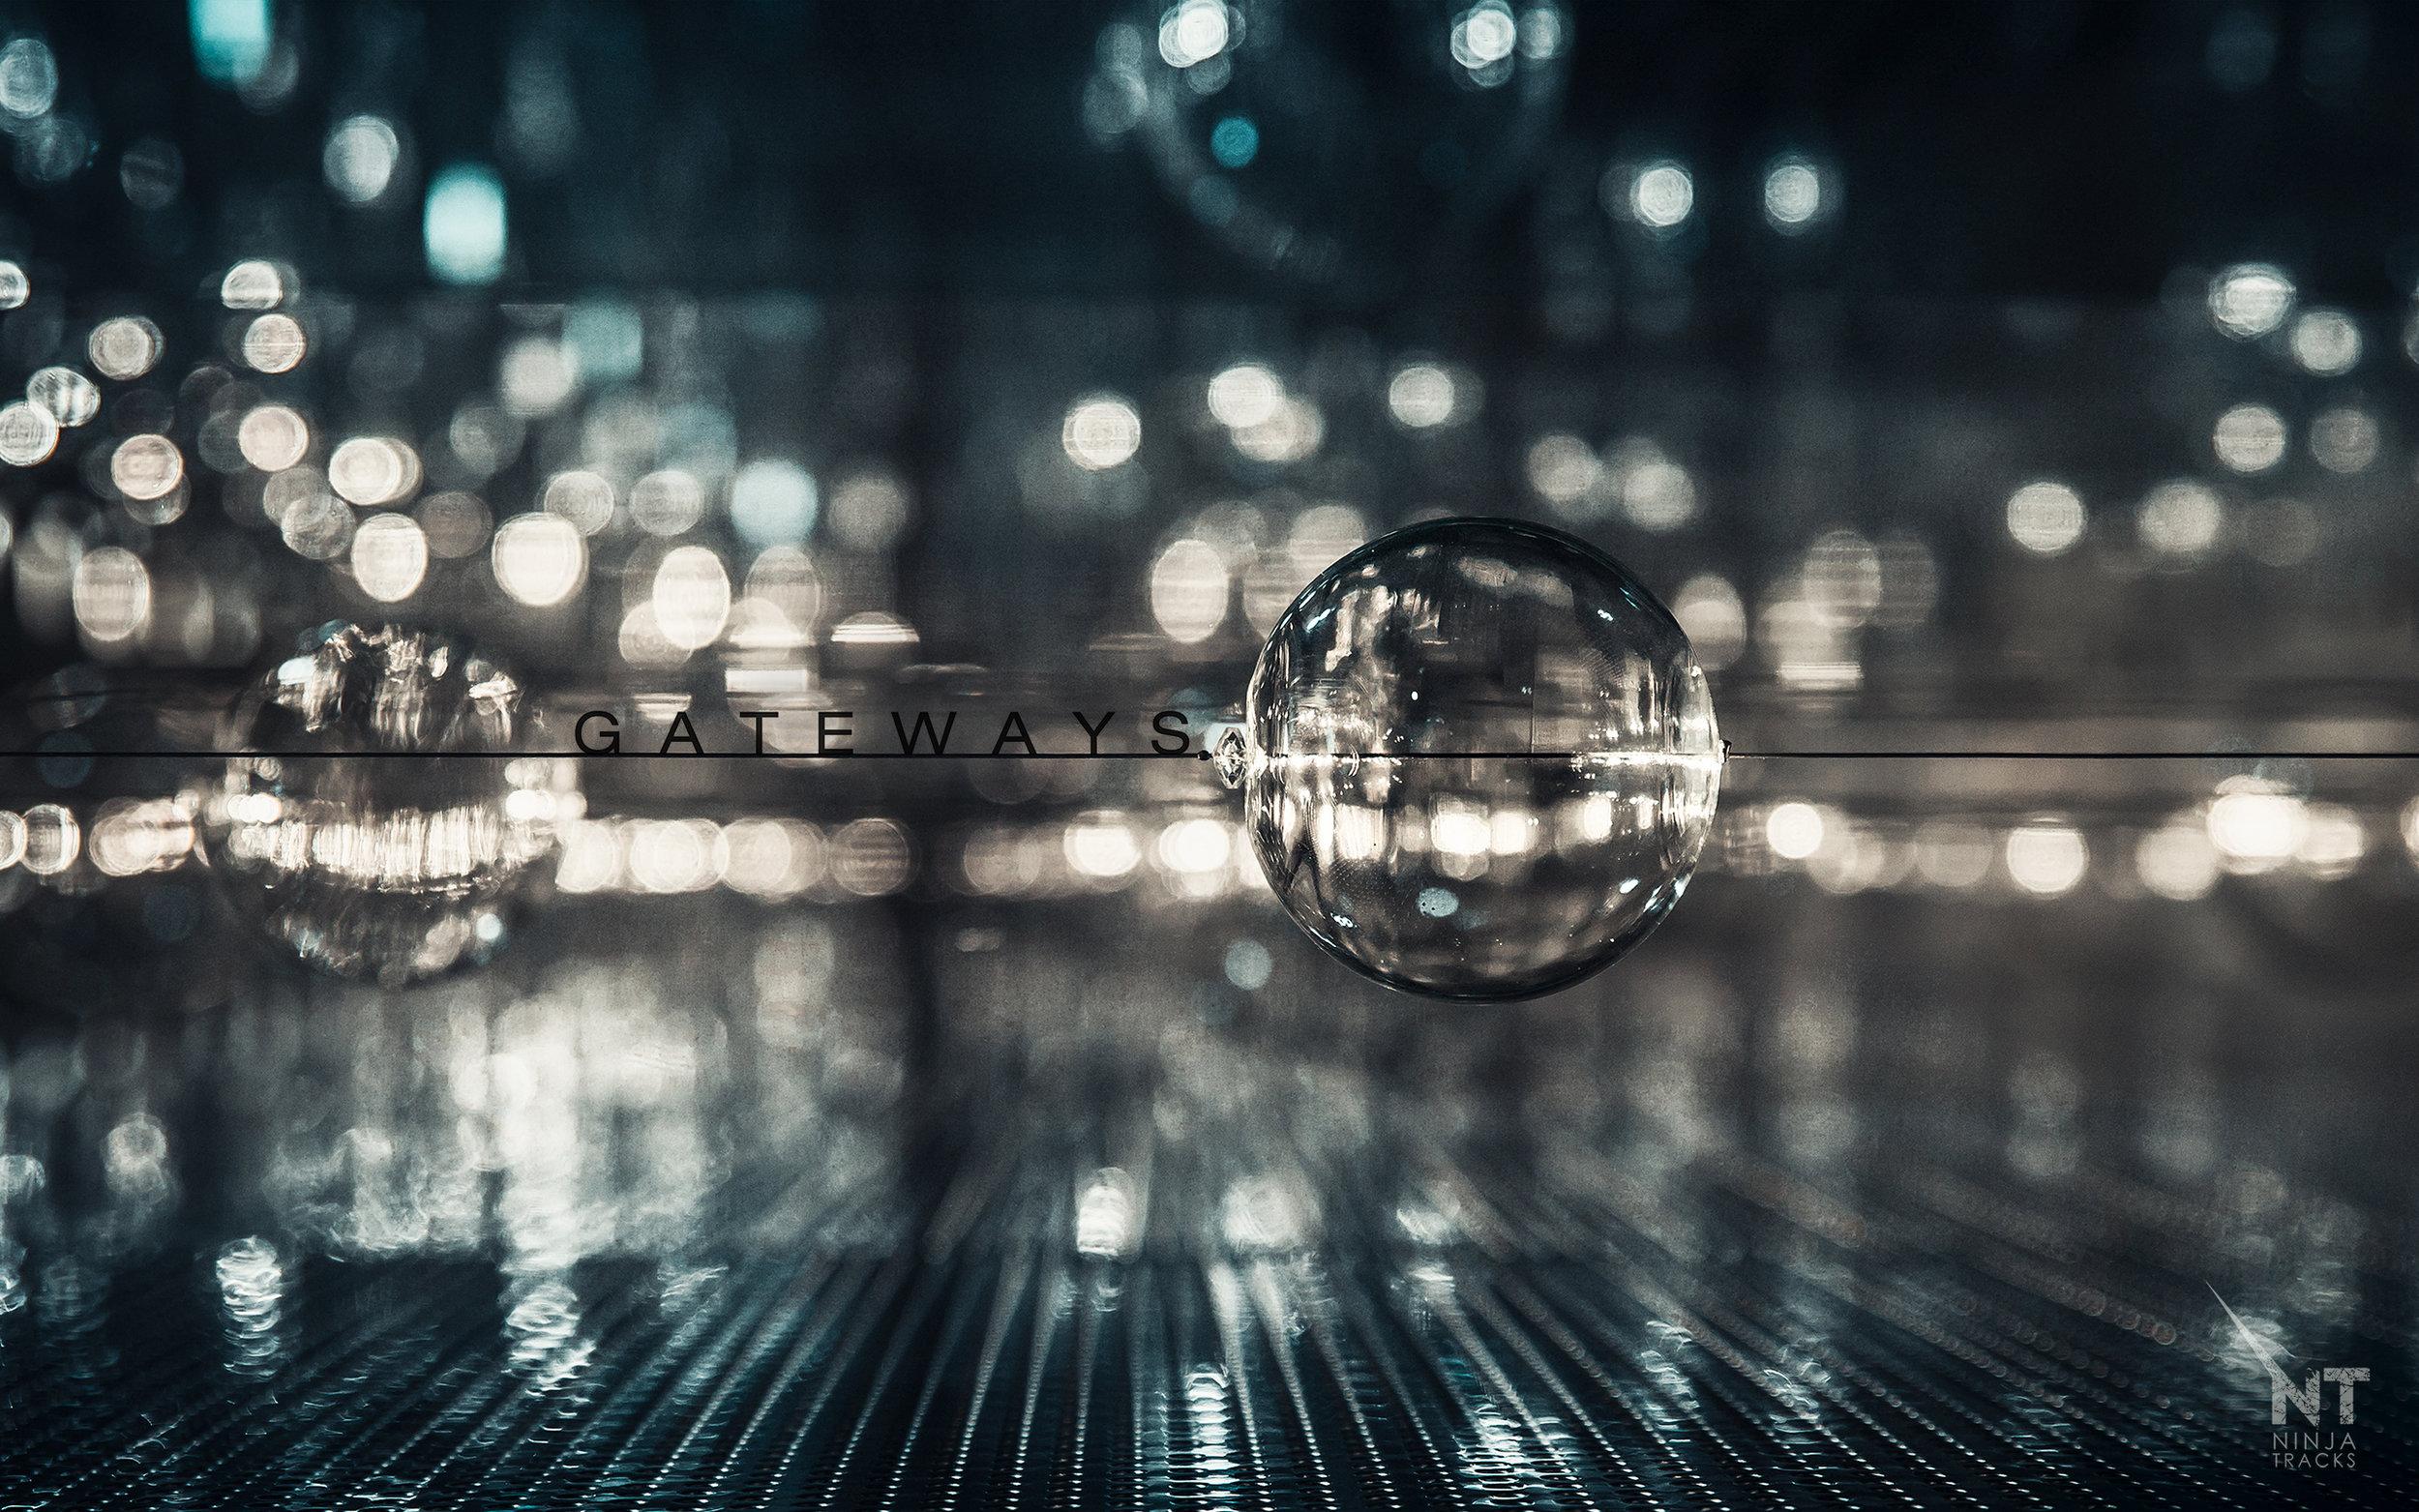 Gateways 2560x1600.jpg